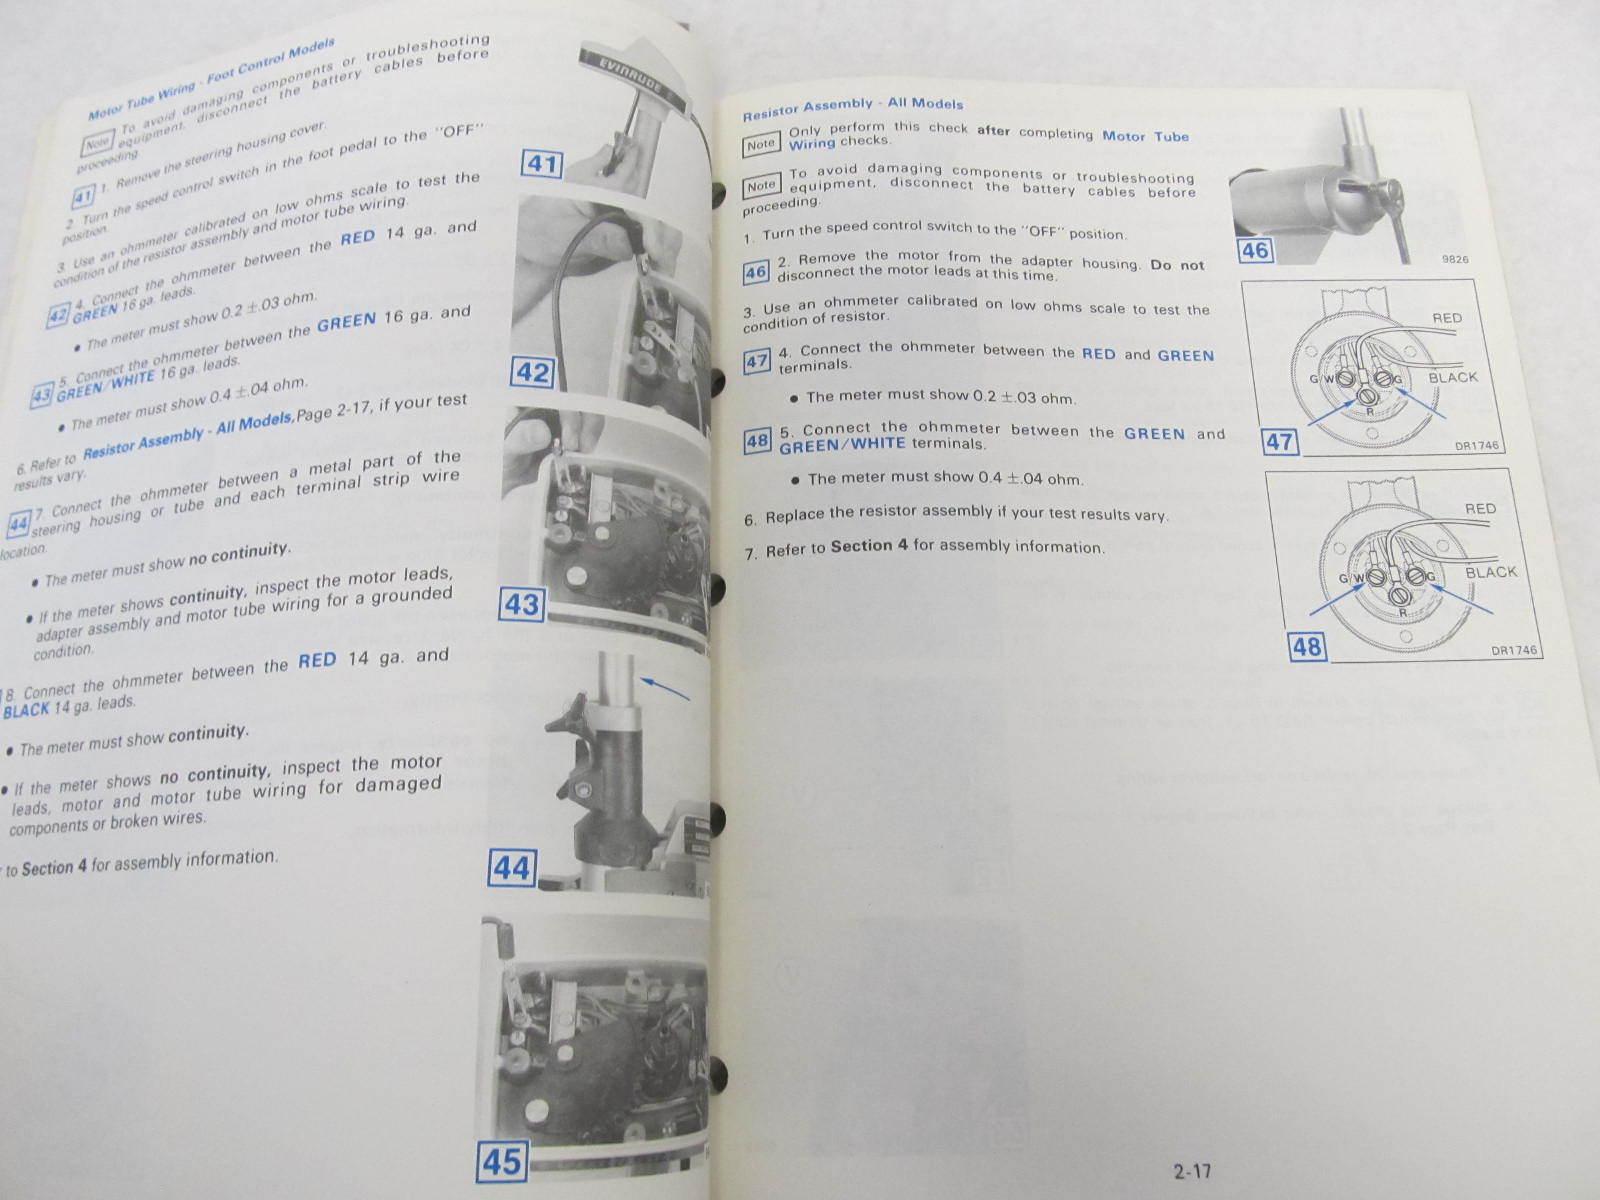 1988 Johnson Manual